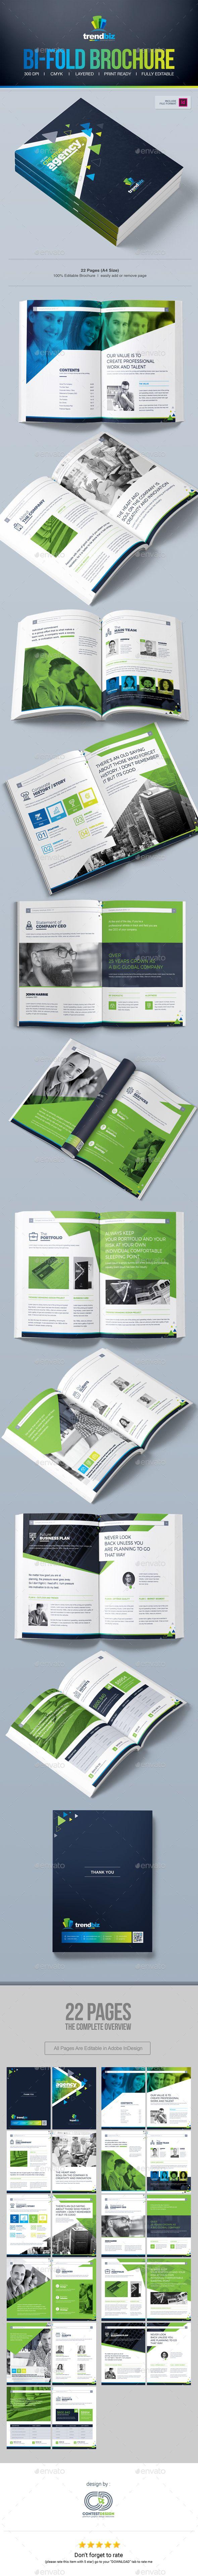 Brochure Design   Bi-Fold Brochure   Brochure Template InDesign INDD